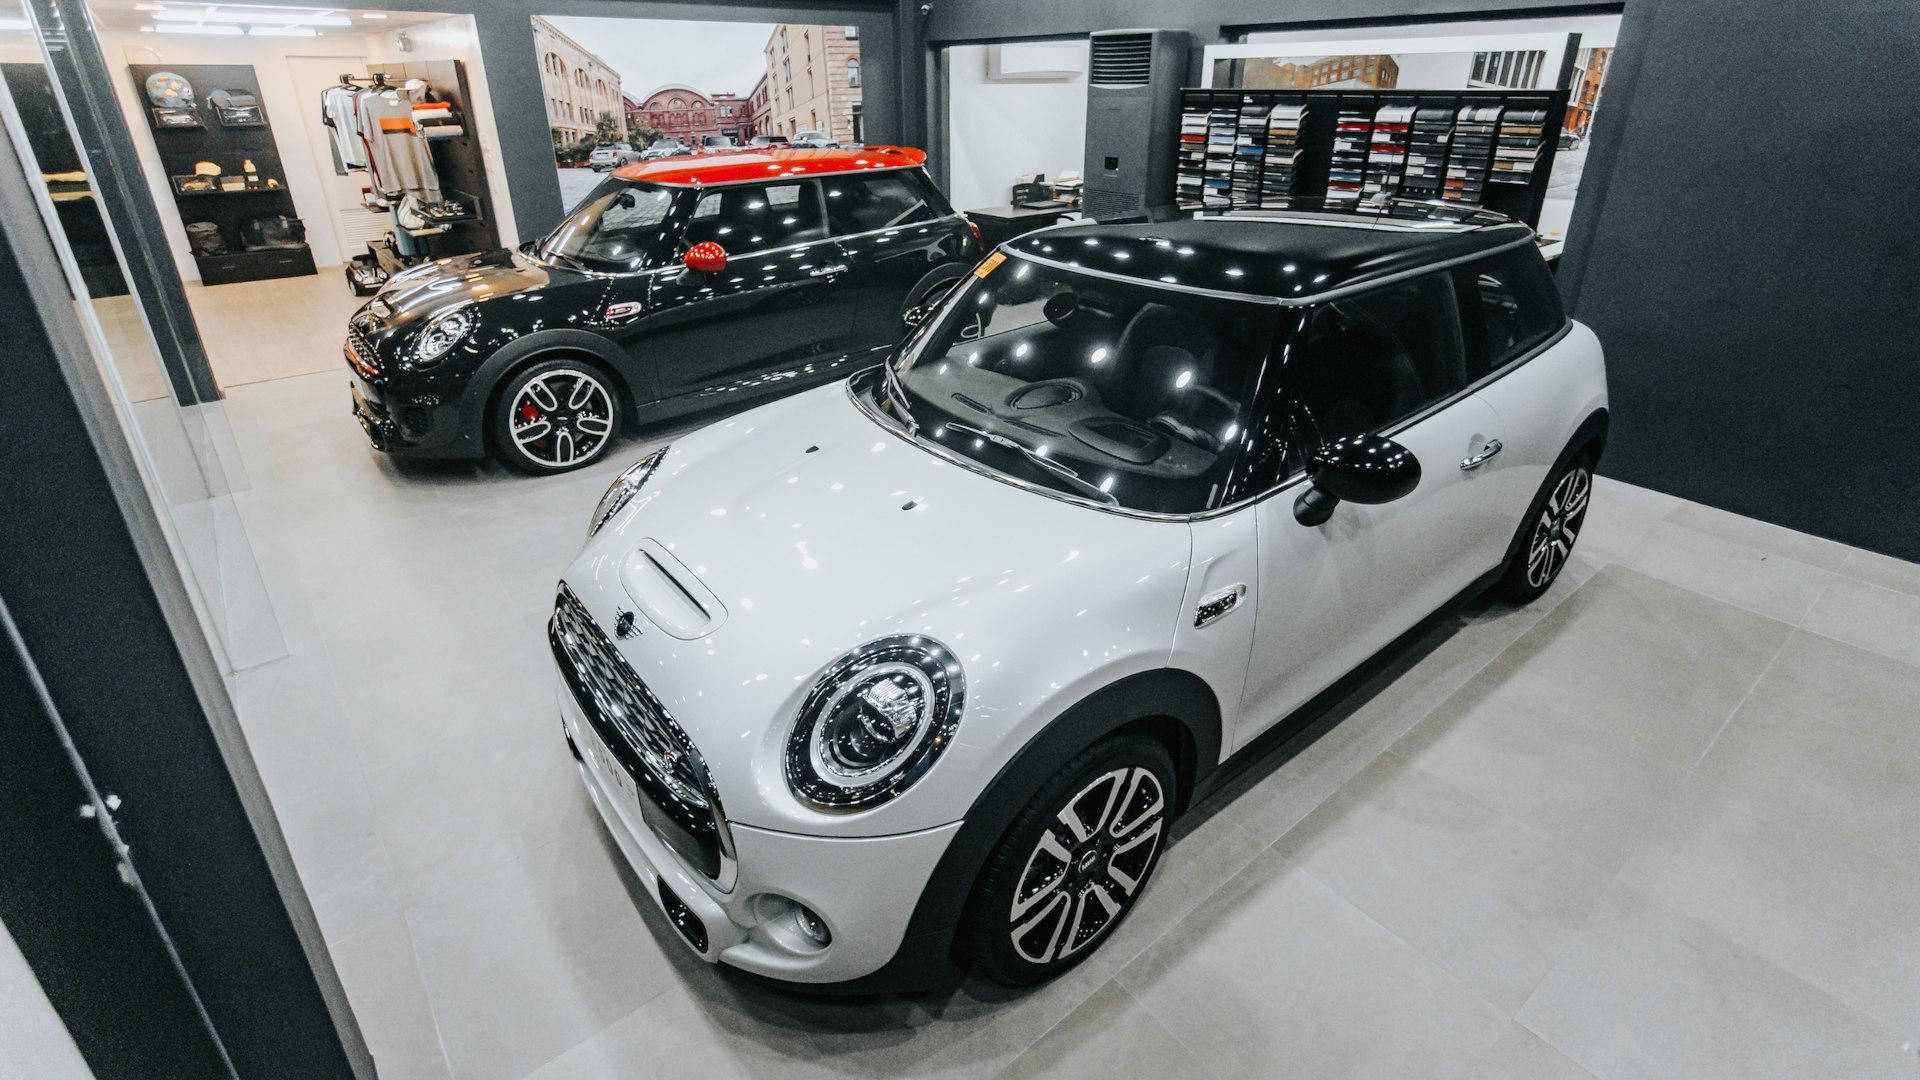 Two Minis on display at the new AutoStudio Cebu